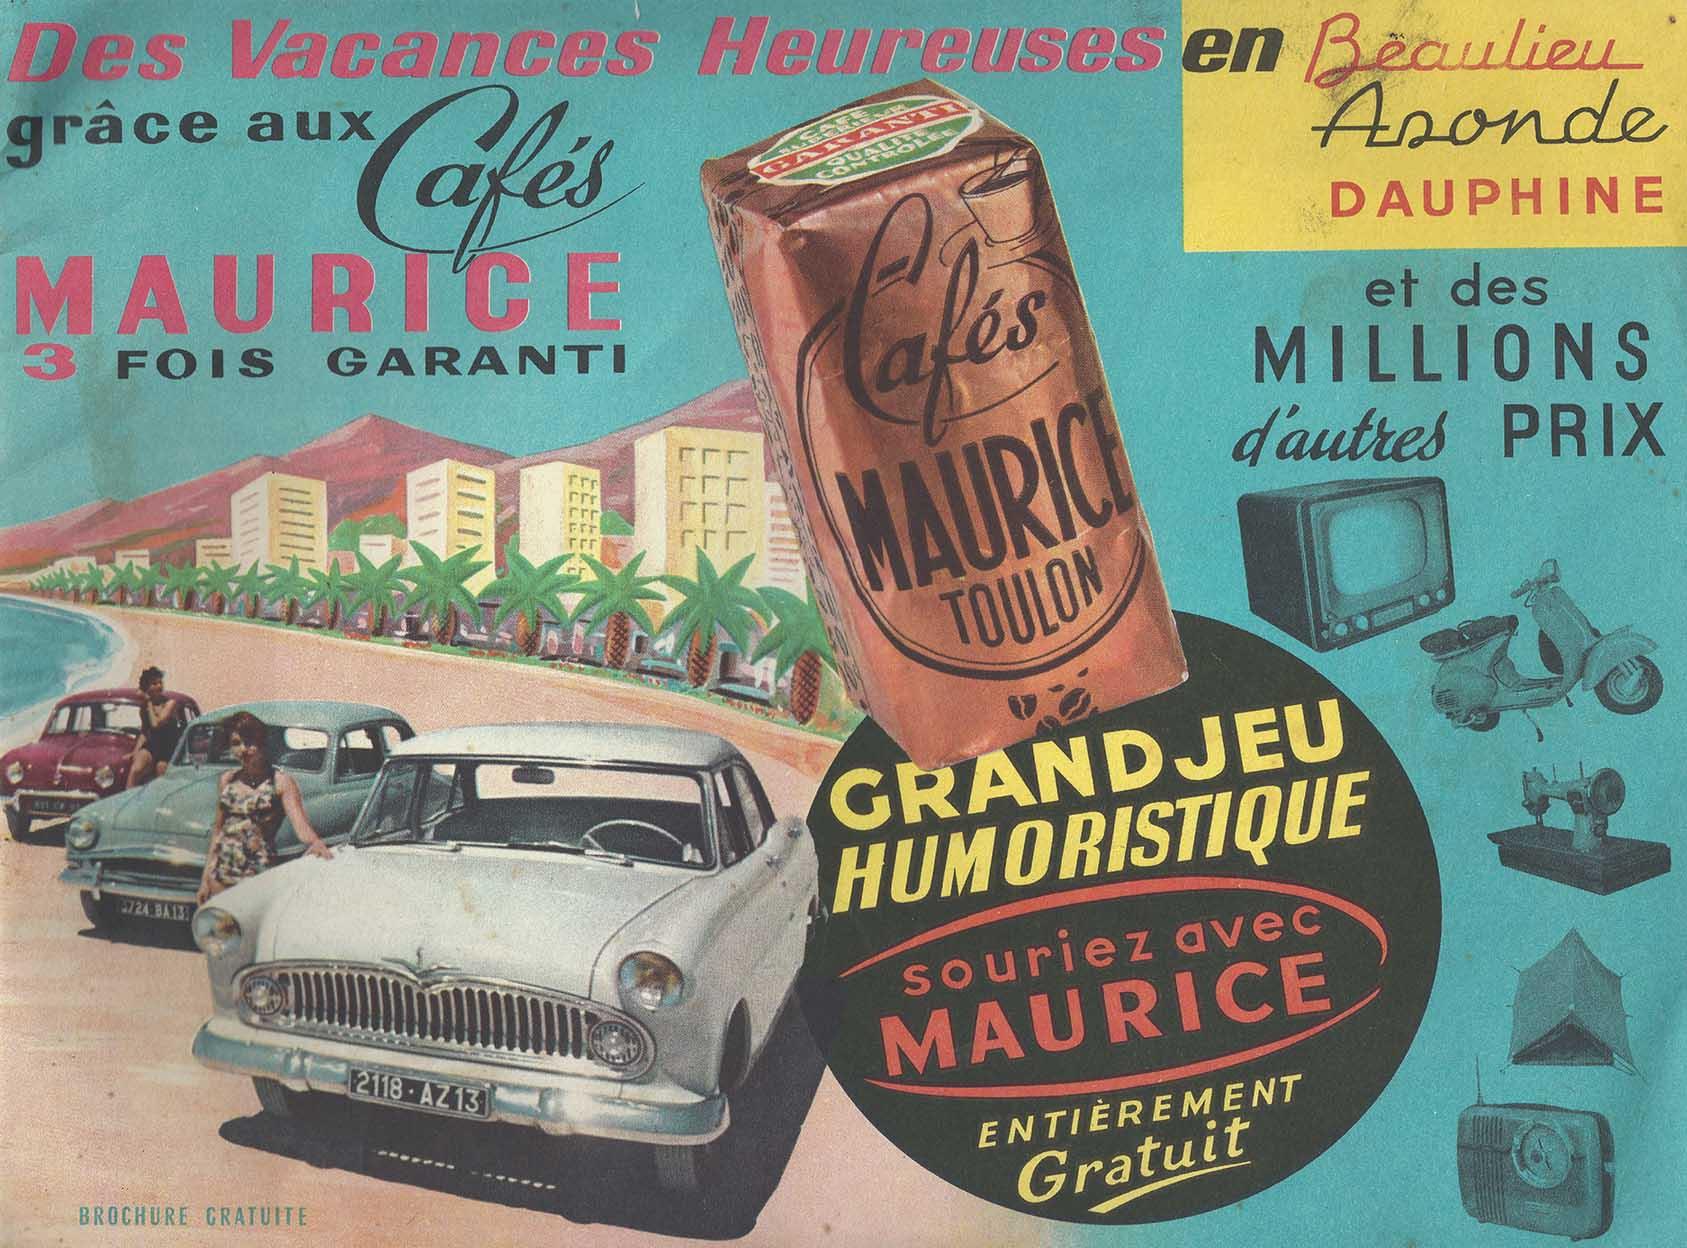 Grand jeu humoristique Cafés Maurice